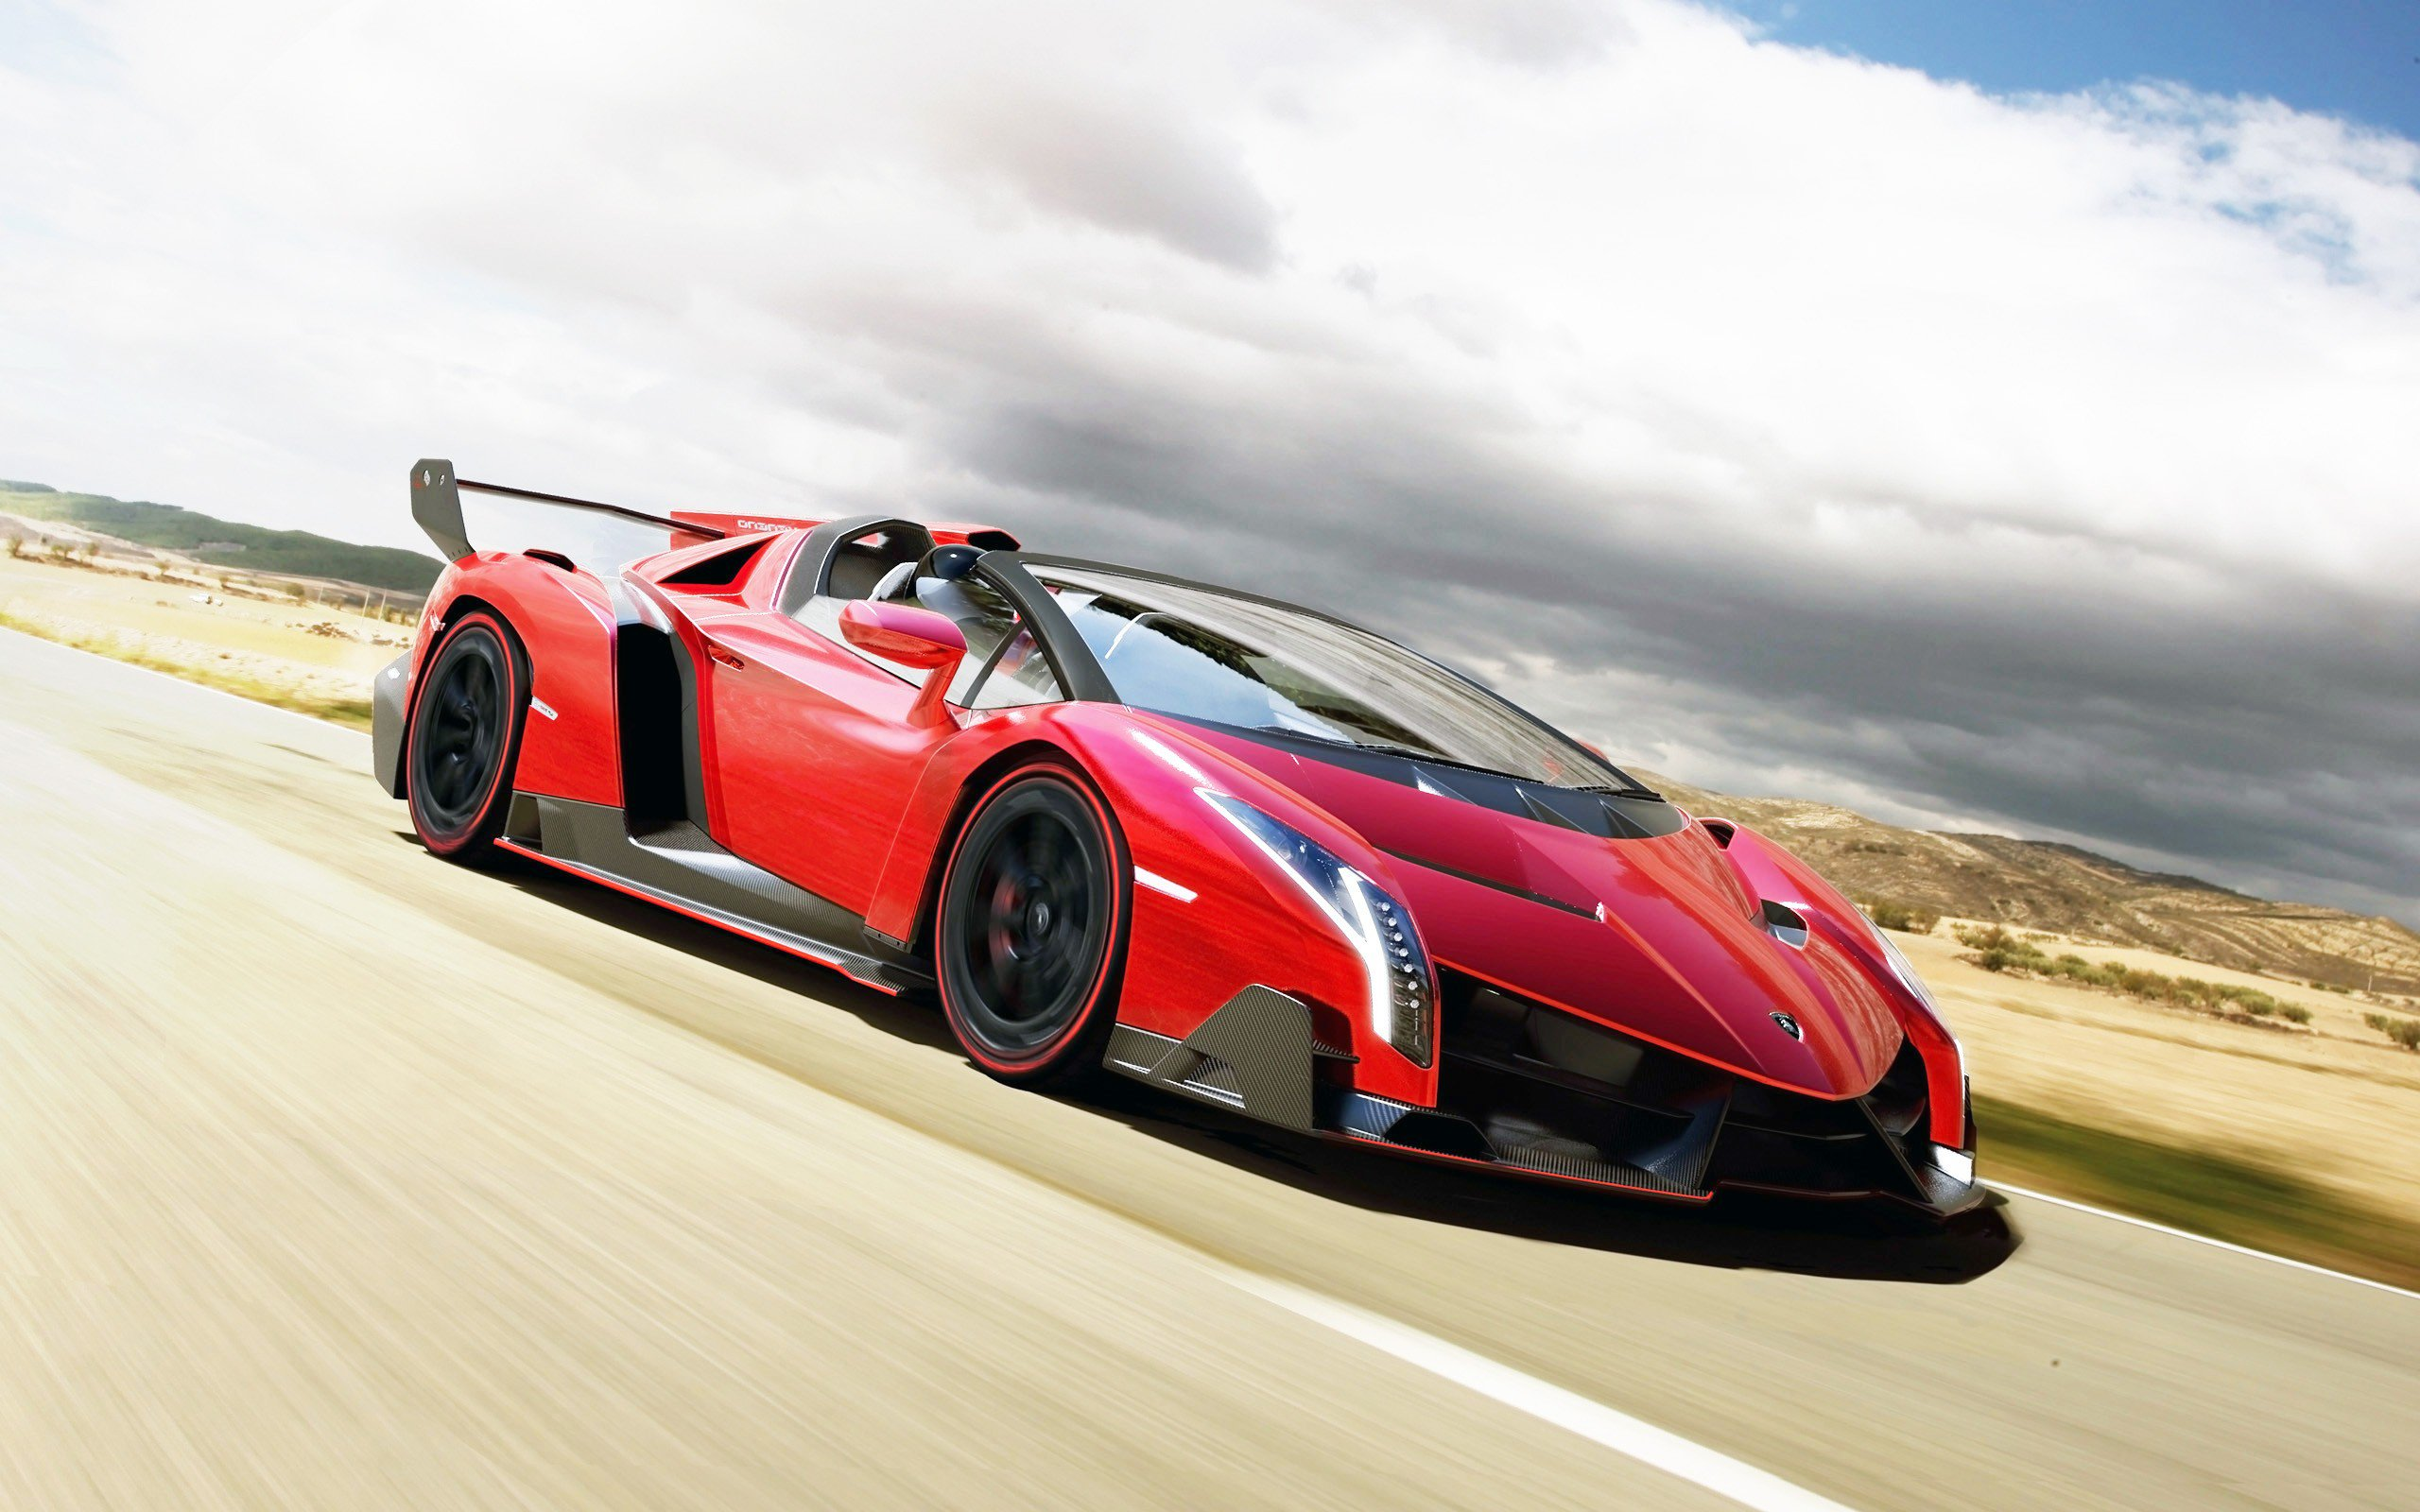 Lamborghini Veneno Wallpaper Gallery - Wallpaper And Free ...